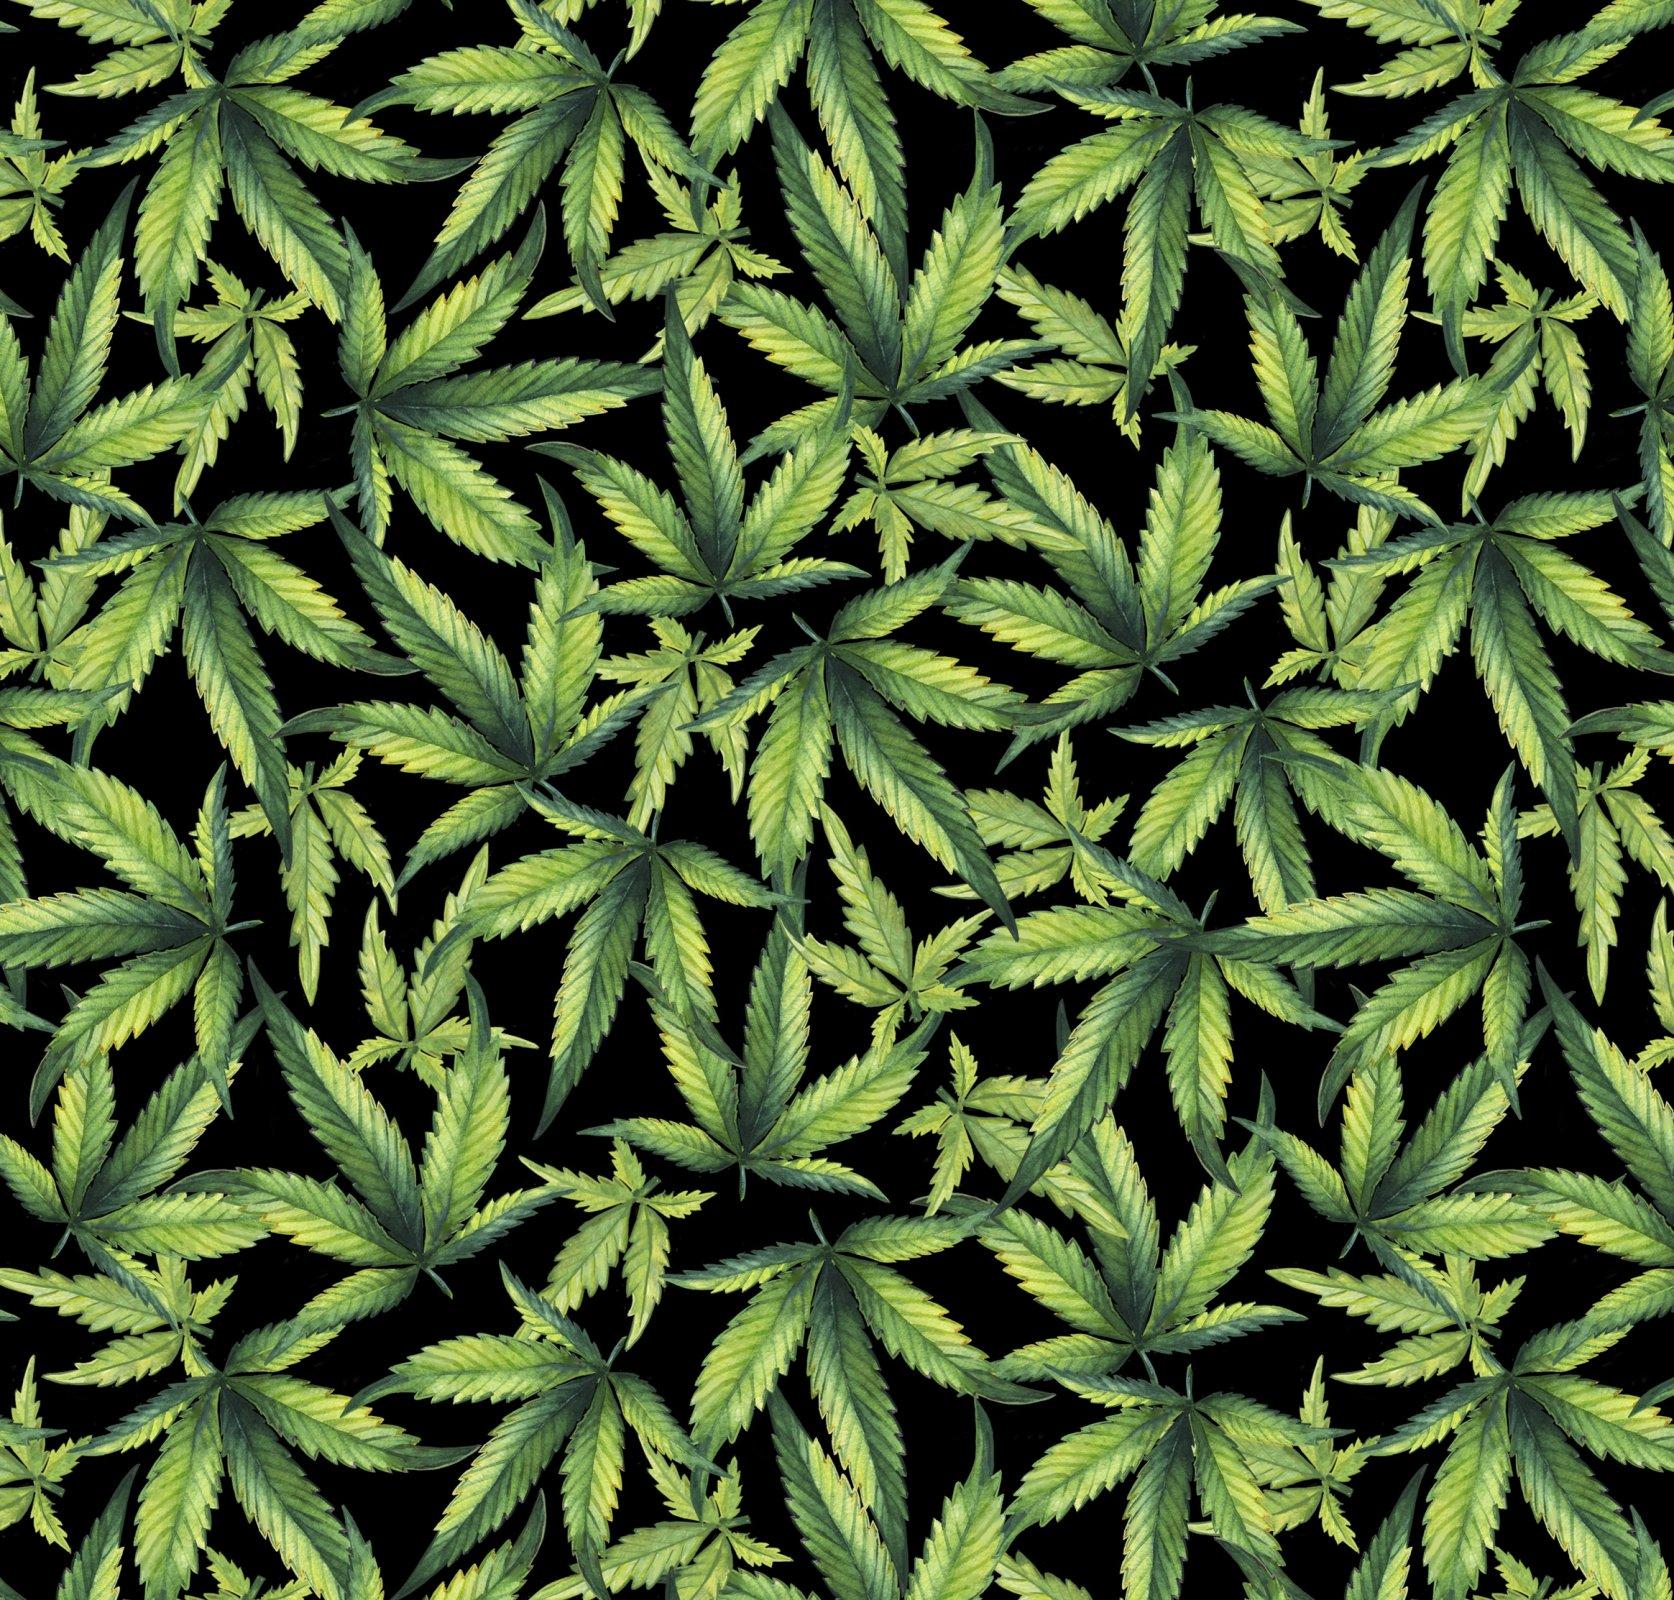 DT-Exclusive Digital Prints DX-1323-0C-1 Black/Multi - Marijuana Plant